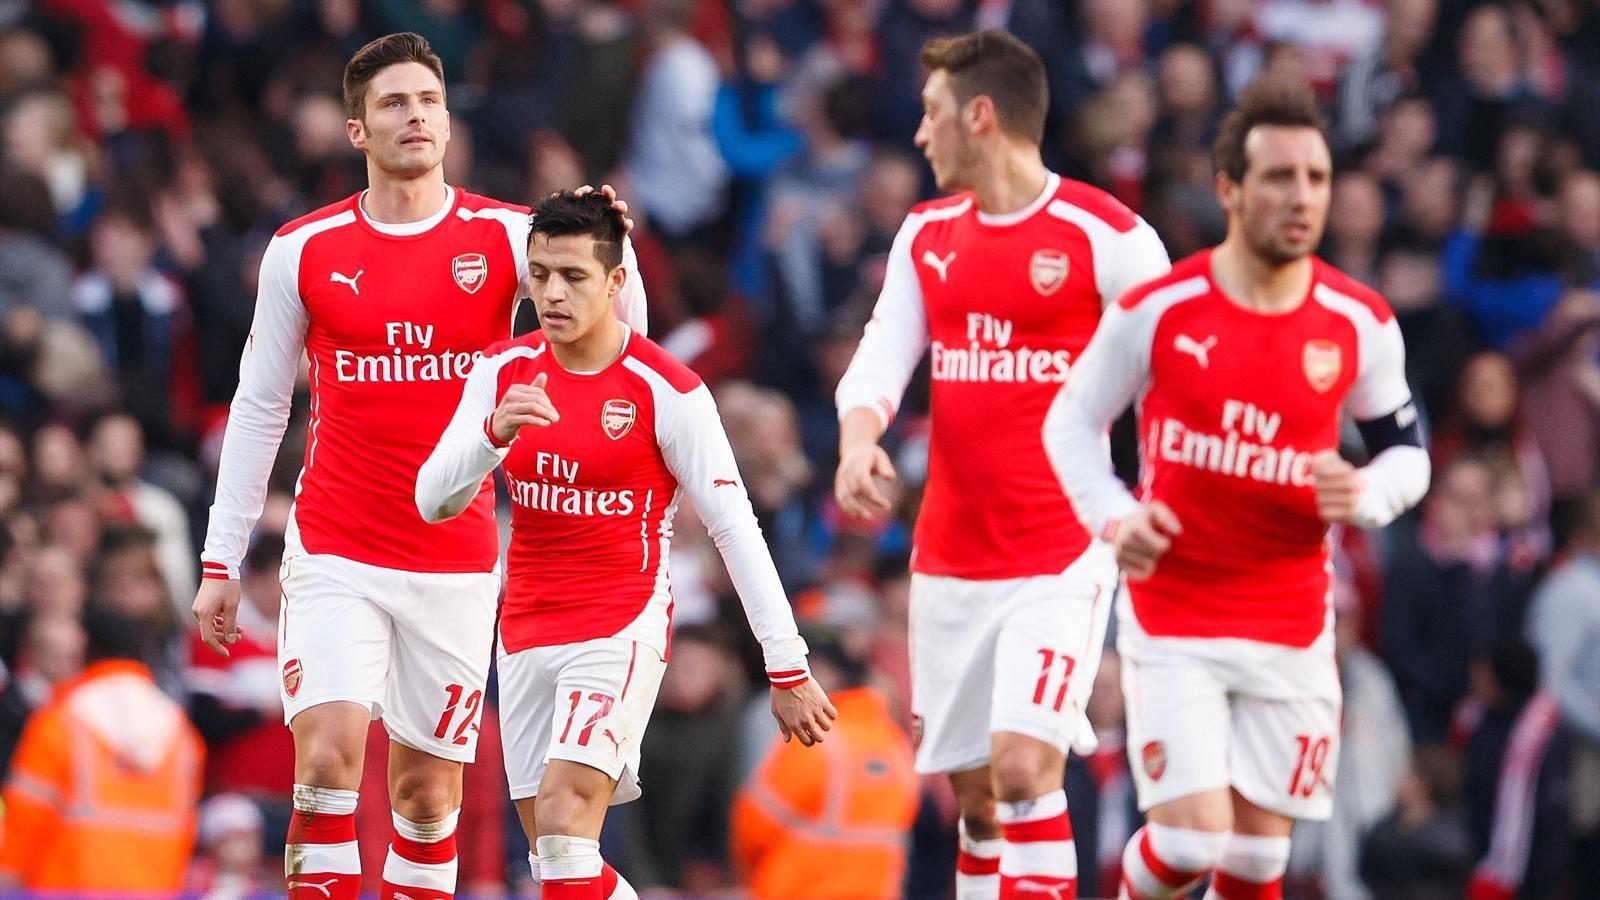 Arsenal Live Wallpaper Hd Arsenal Vs Wolfsburg Strongest Possible Arsenal Lineup